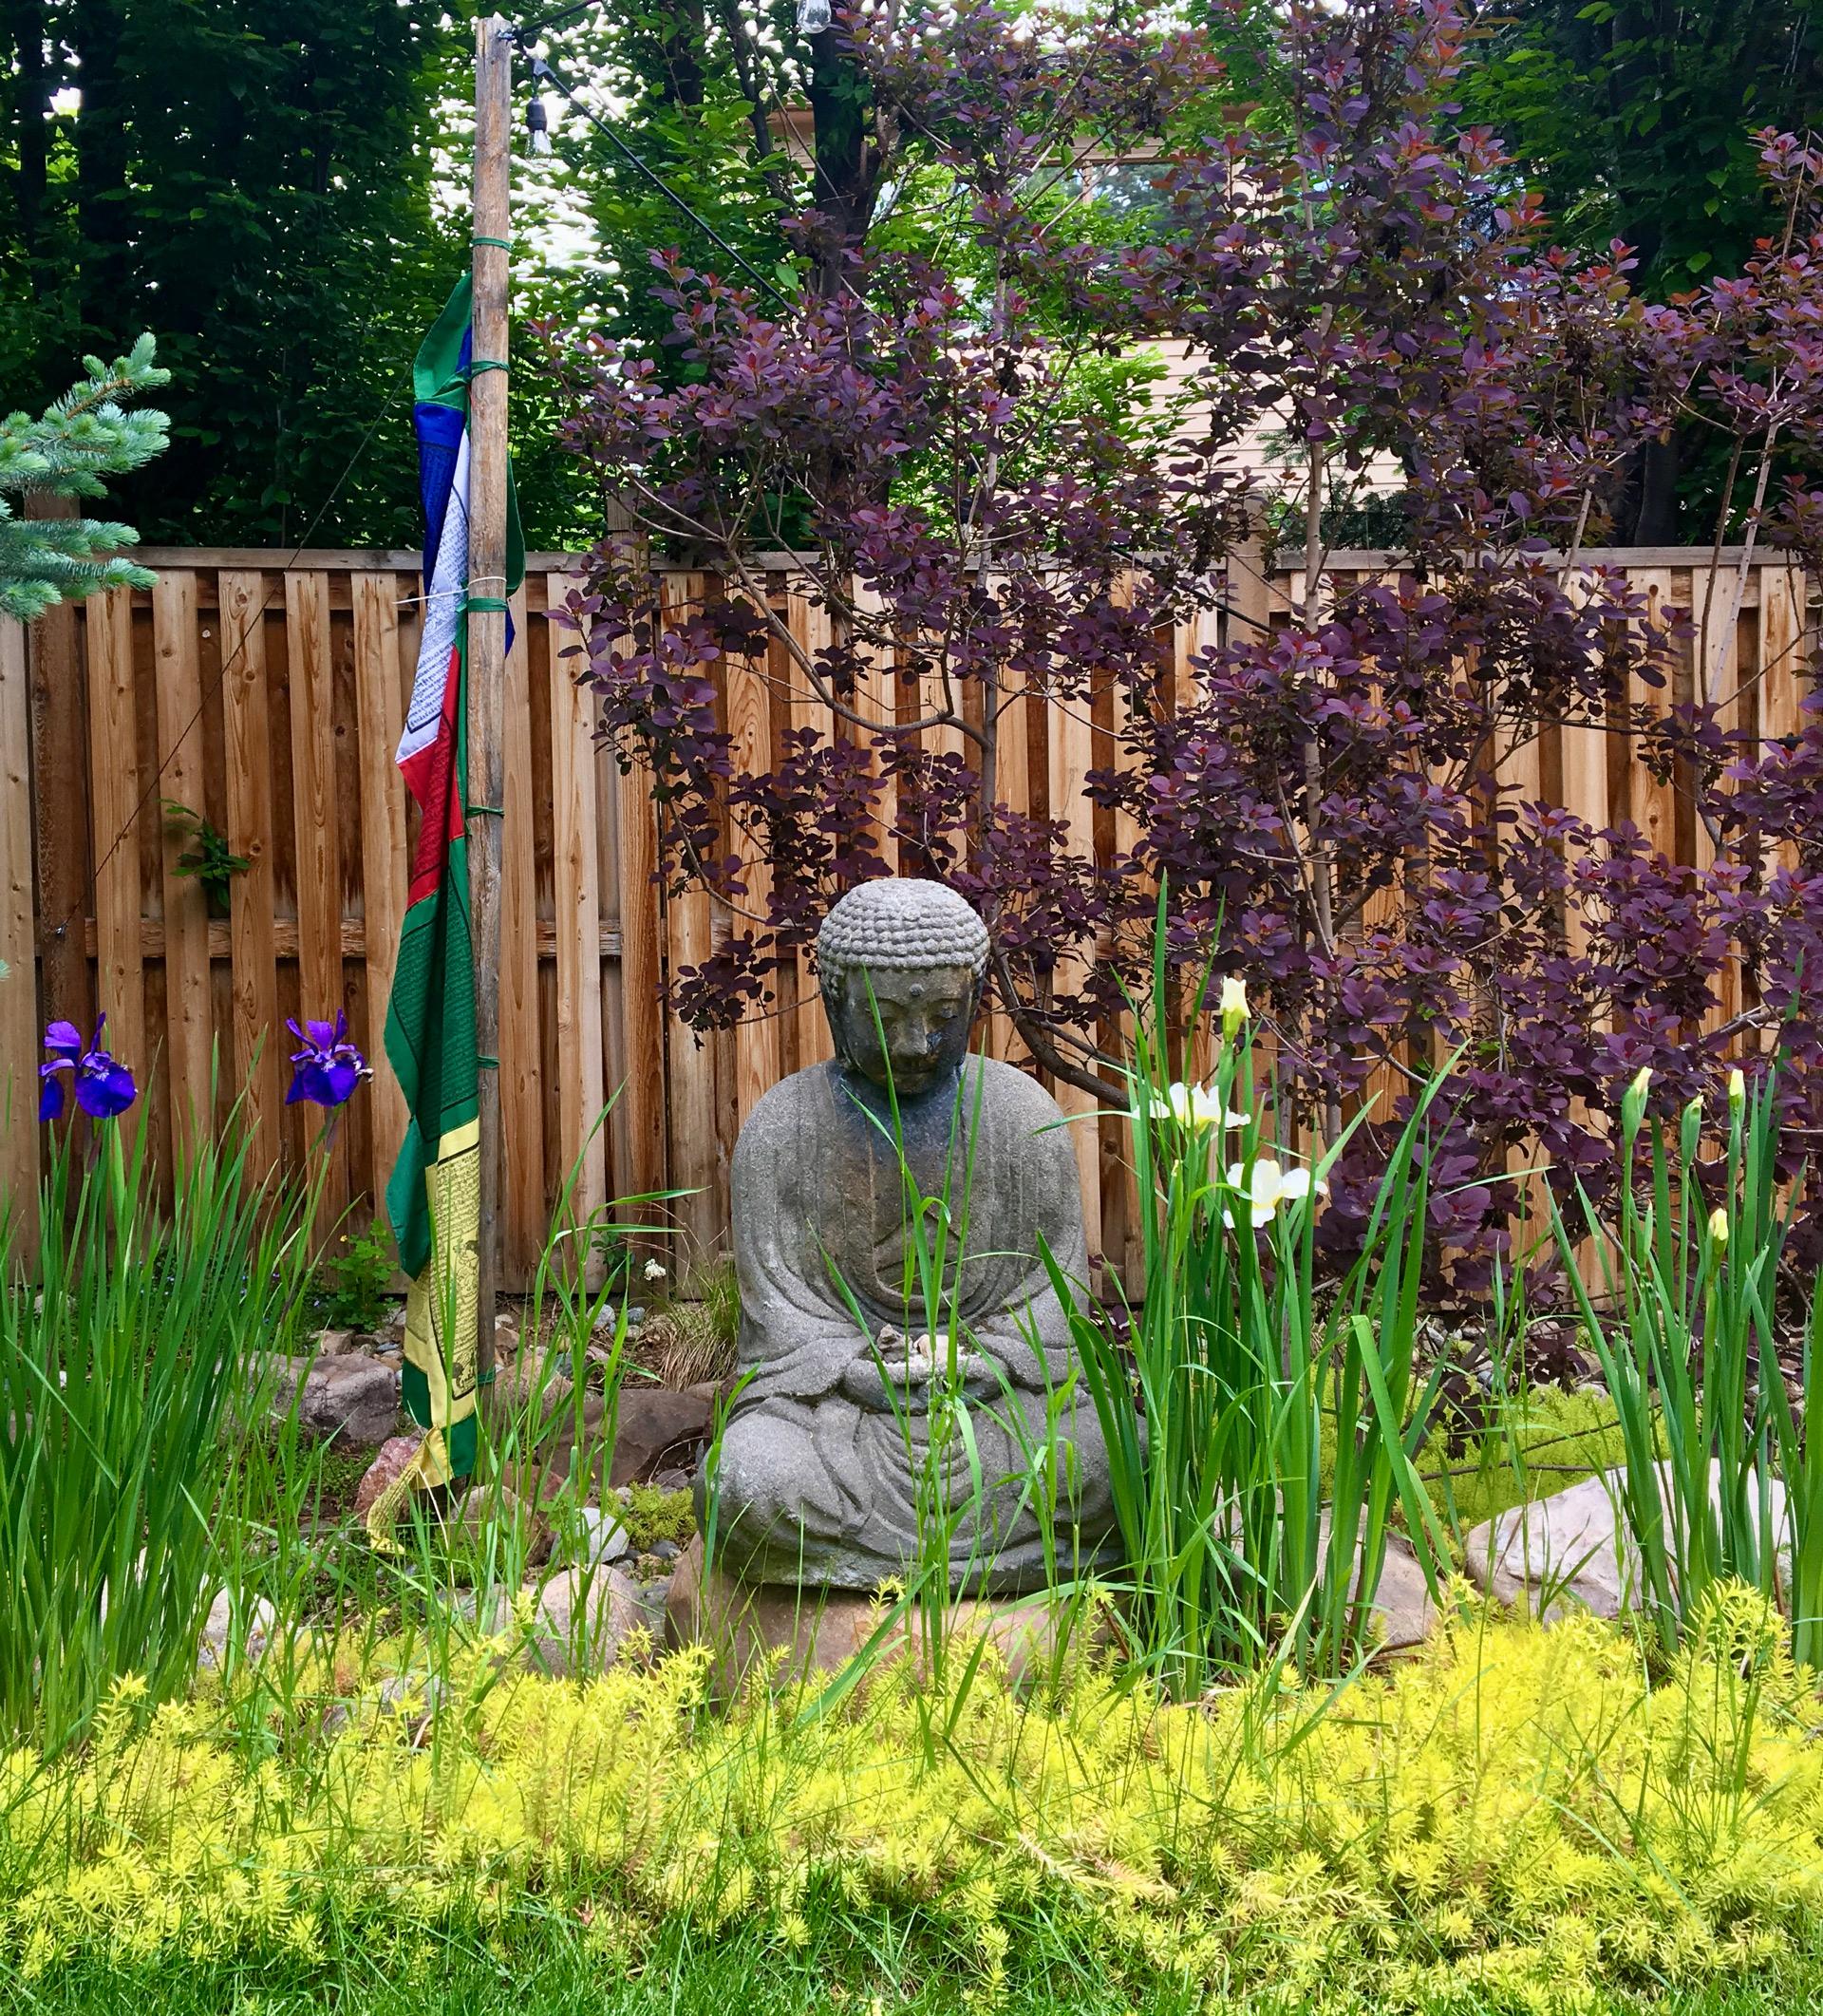 Spiritual Energy Healing , John of God , & Soul Retrieval by Healing Channels Meditation - Energy Meditations